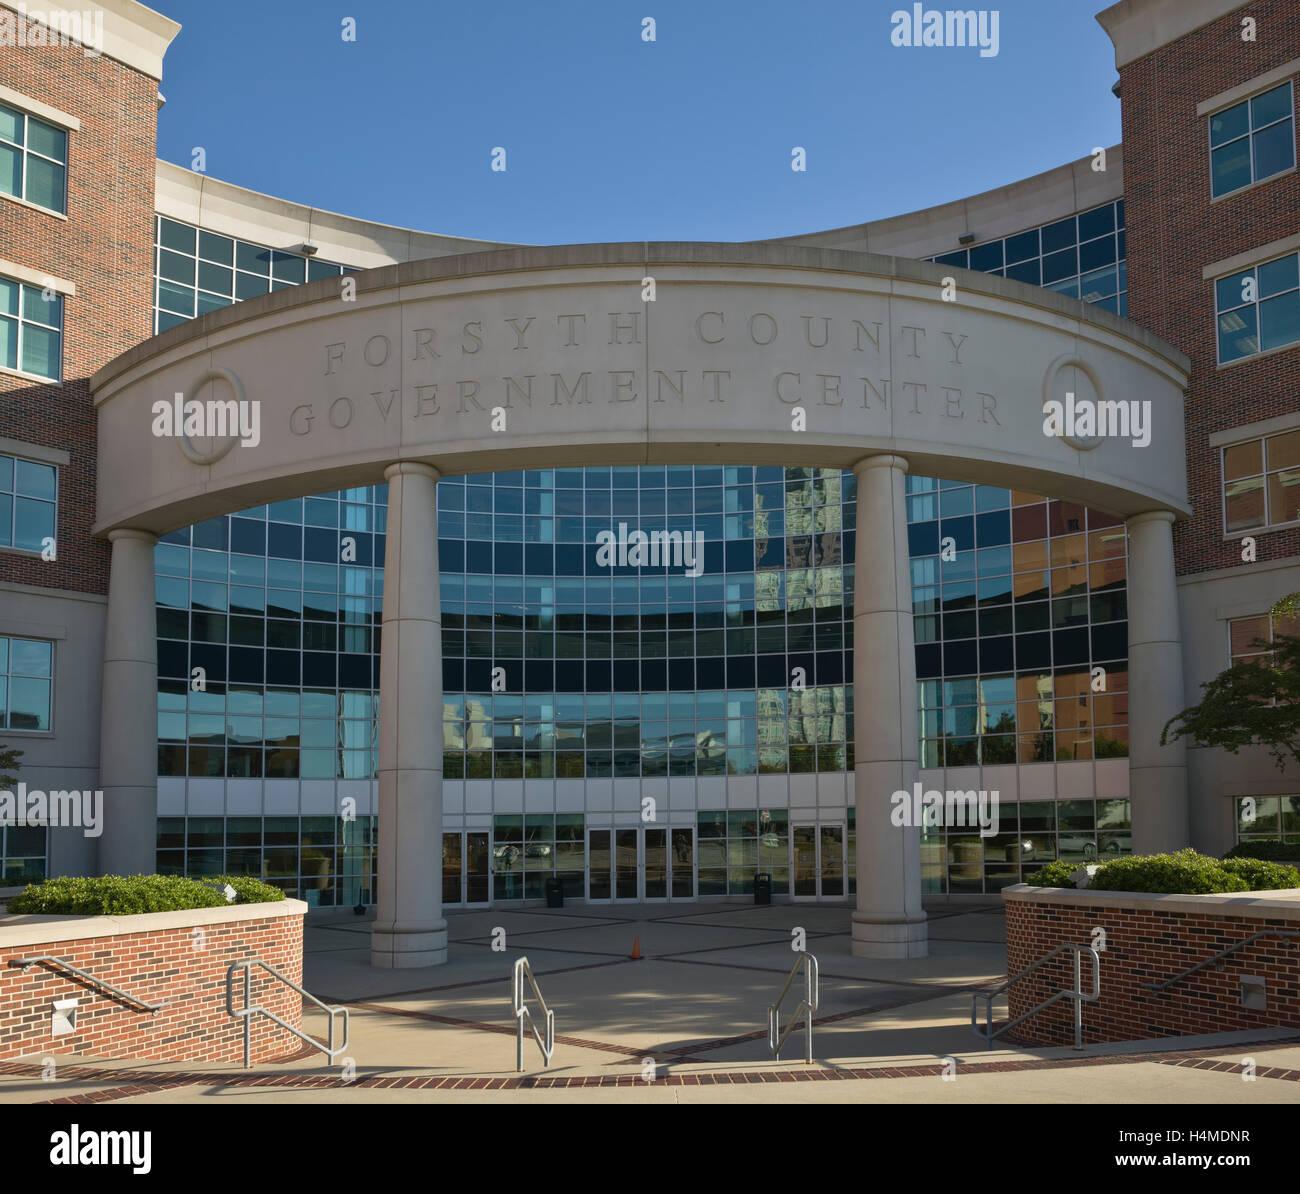 Forsyth County Government Center Gebäude vorderen Eingang Winston-Salem, North Carolina Stockbild